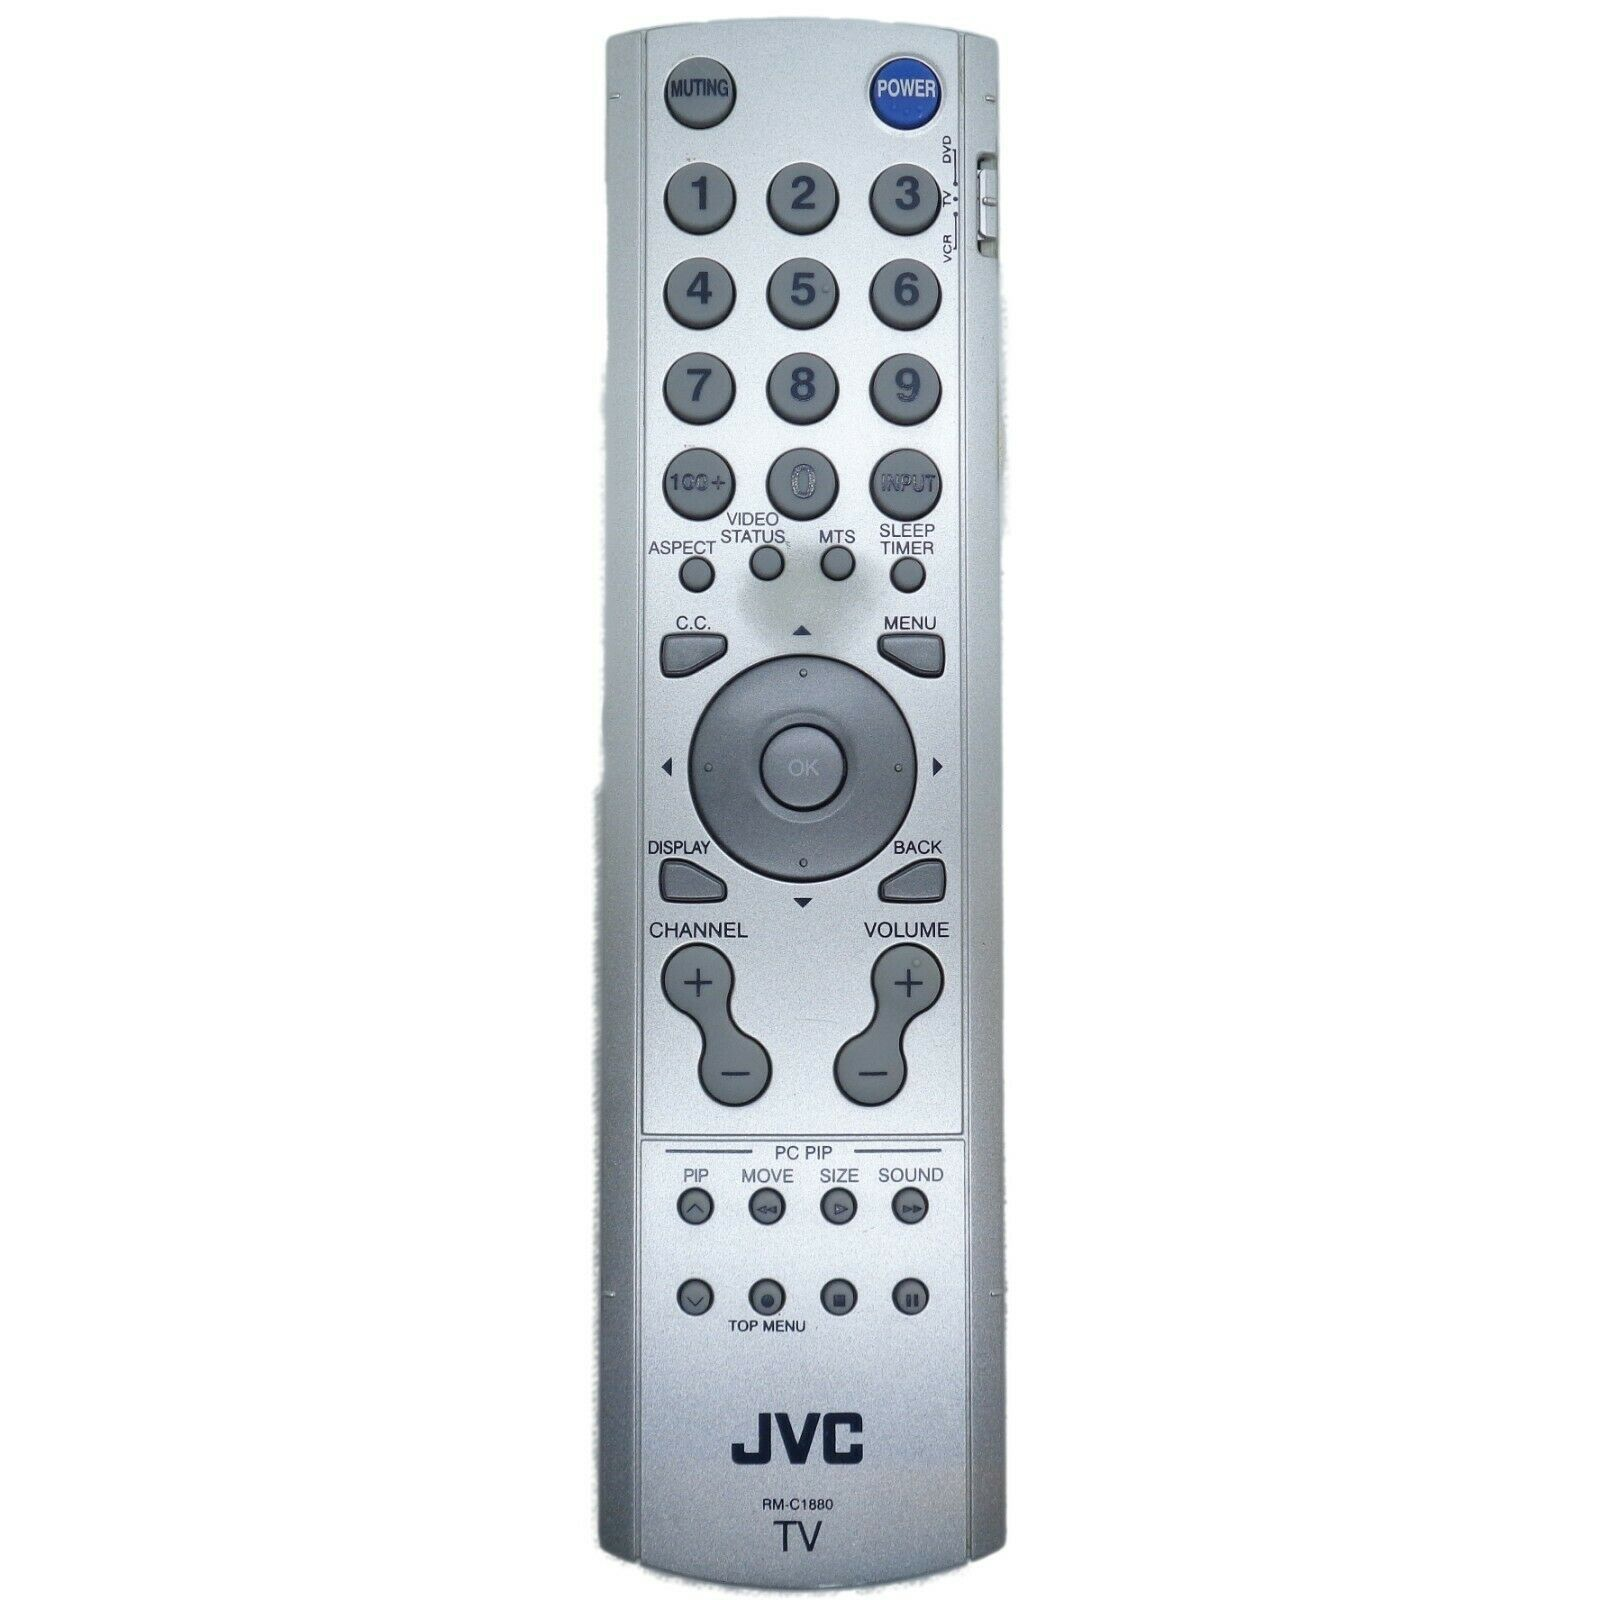 JVC RM-C1880 Factory Original TV Remote LT-17X576, LT-23X576, See Notes & Photos - $9.76